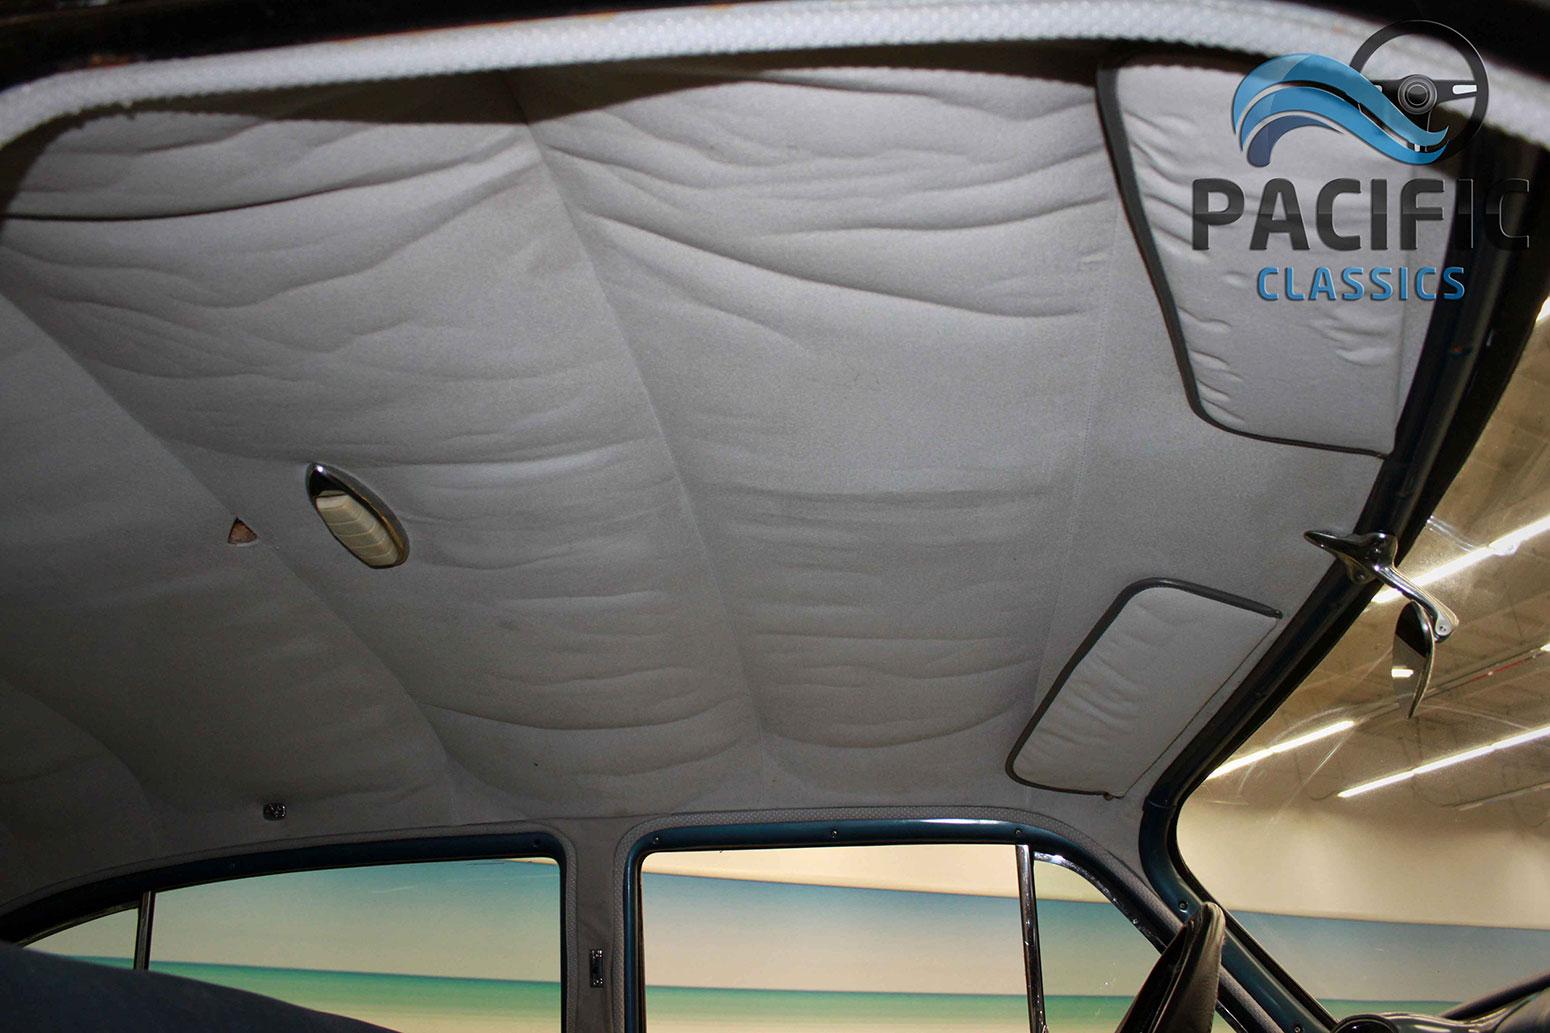 1954 Chrysler Windsor Deluxe Pacific Classics